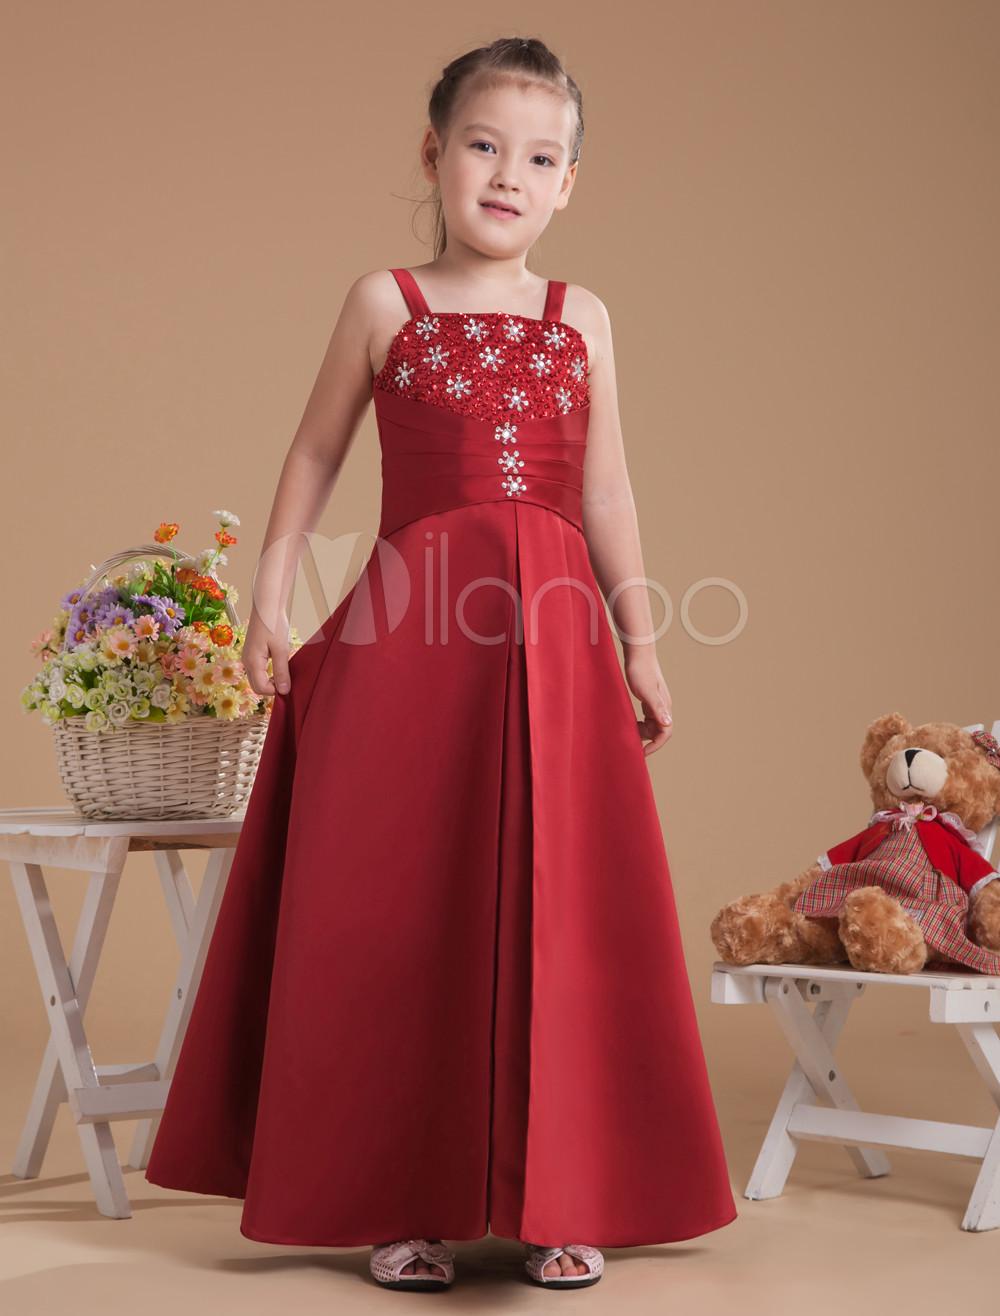 Amazing Red Satin Thin Shoulder Straps Floor Length Junior Bridesmaid Dress